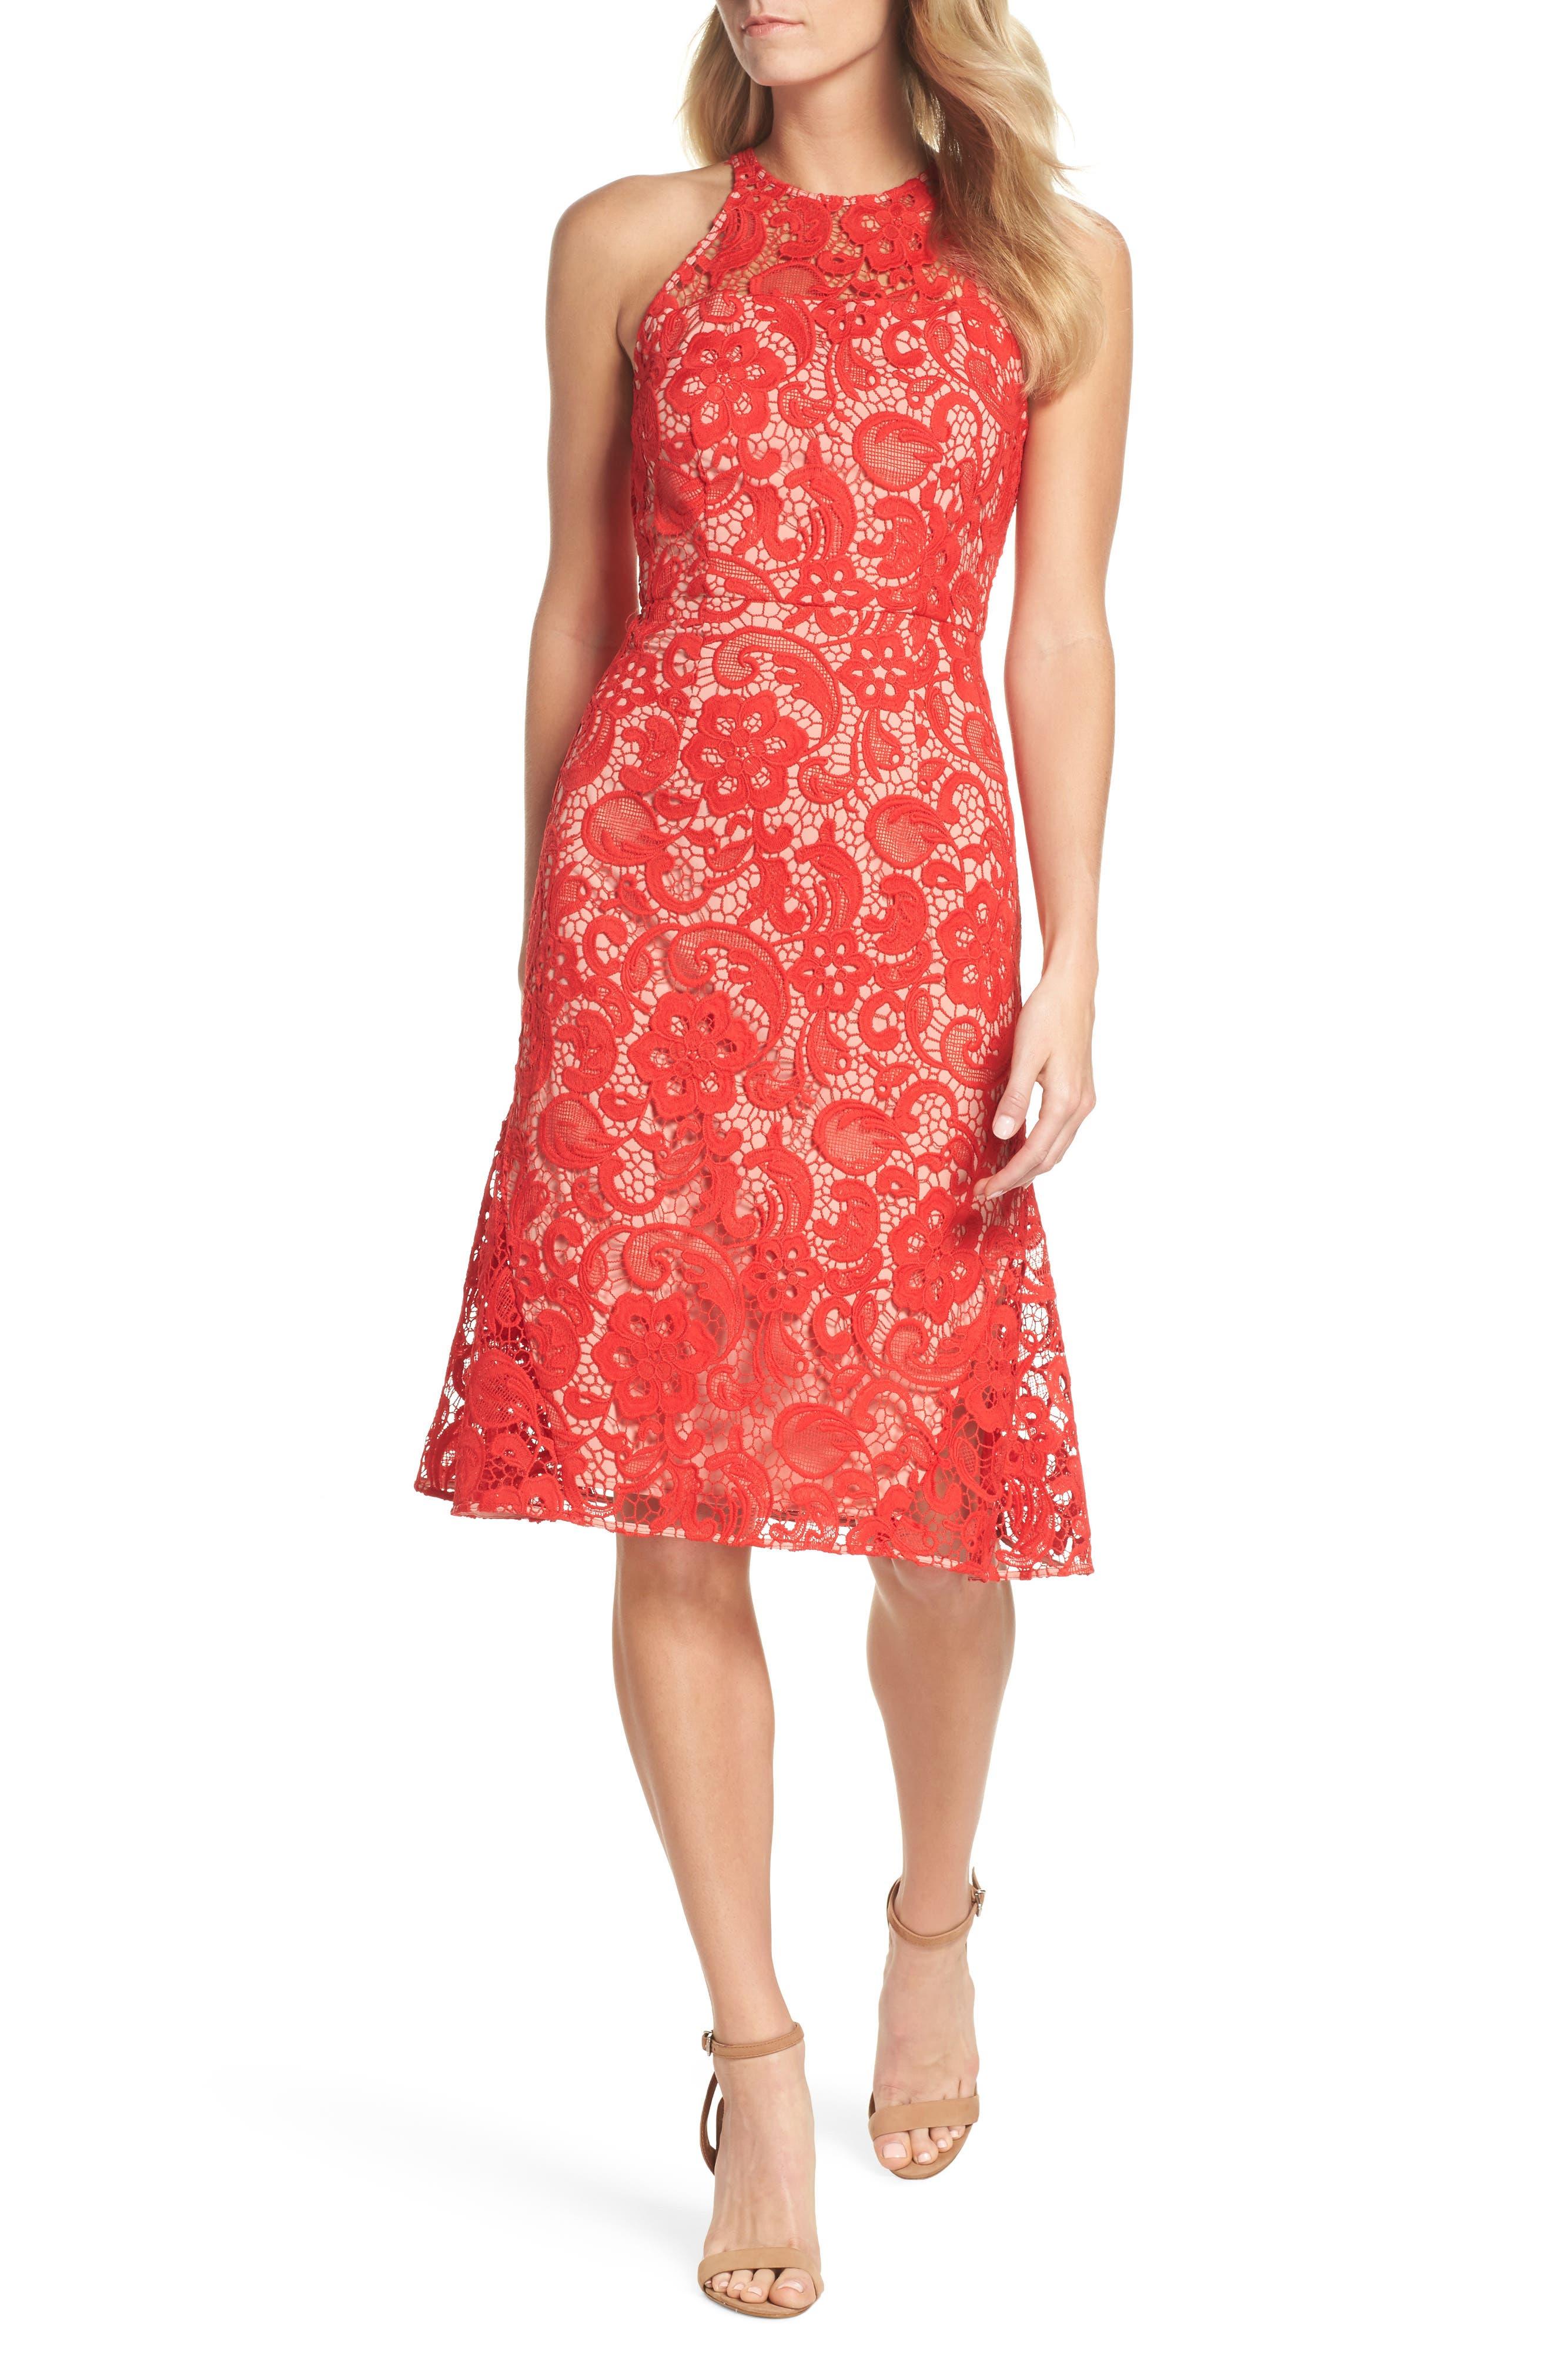 Carnation Lace Dress,                             Main thumbnail 1, color,                             600